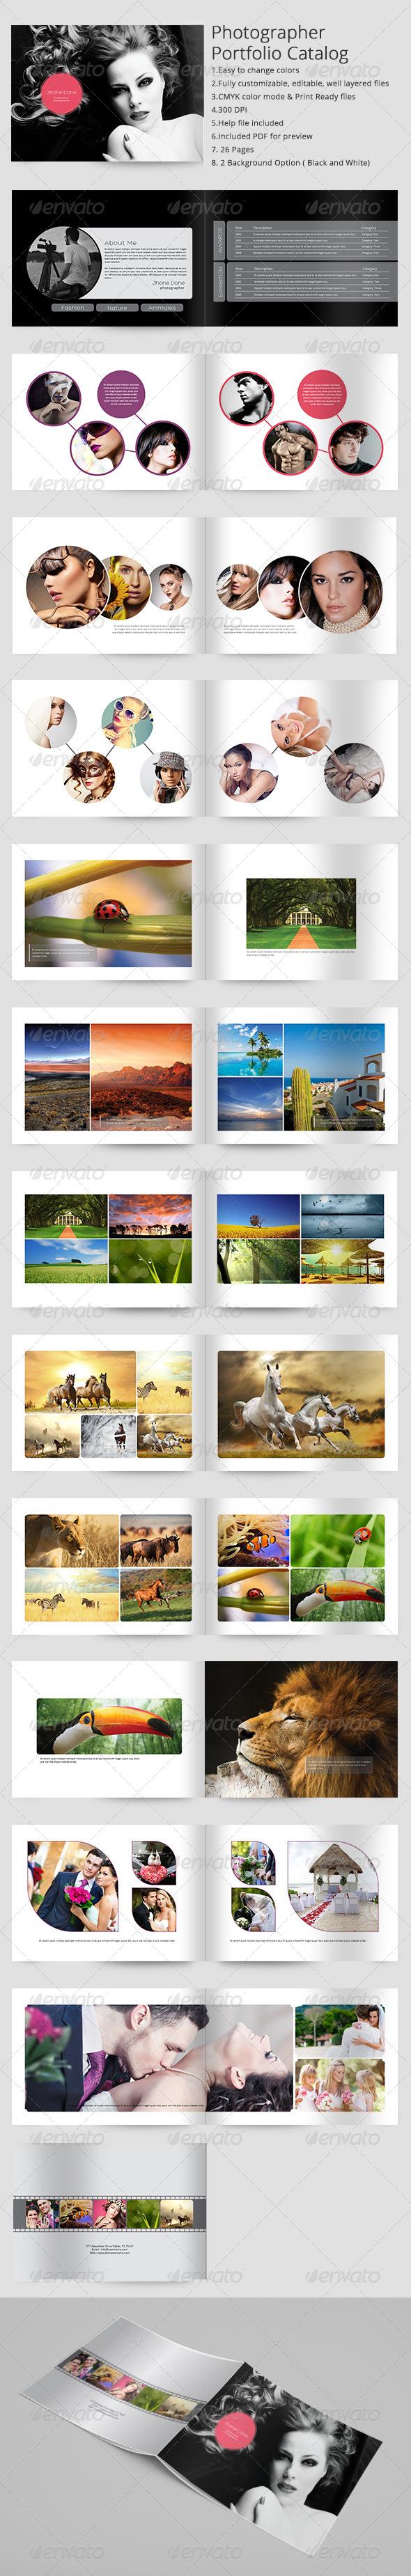 Photographer Portfolio Catalog Indesign Template - Portfolio Brochures